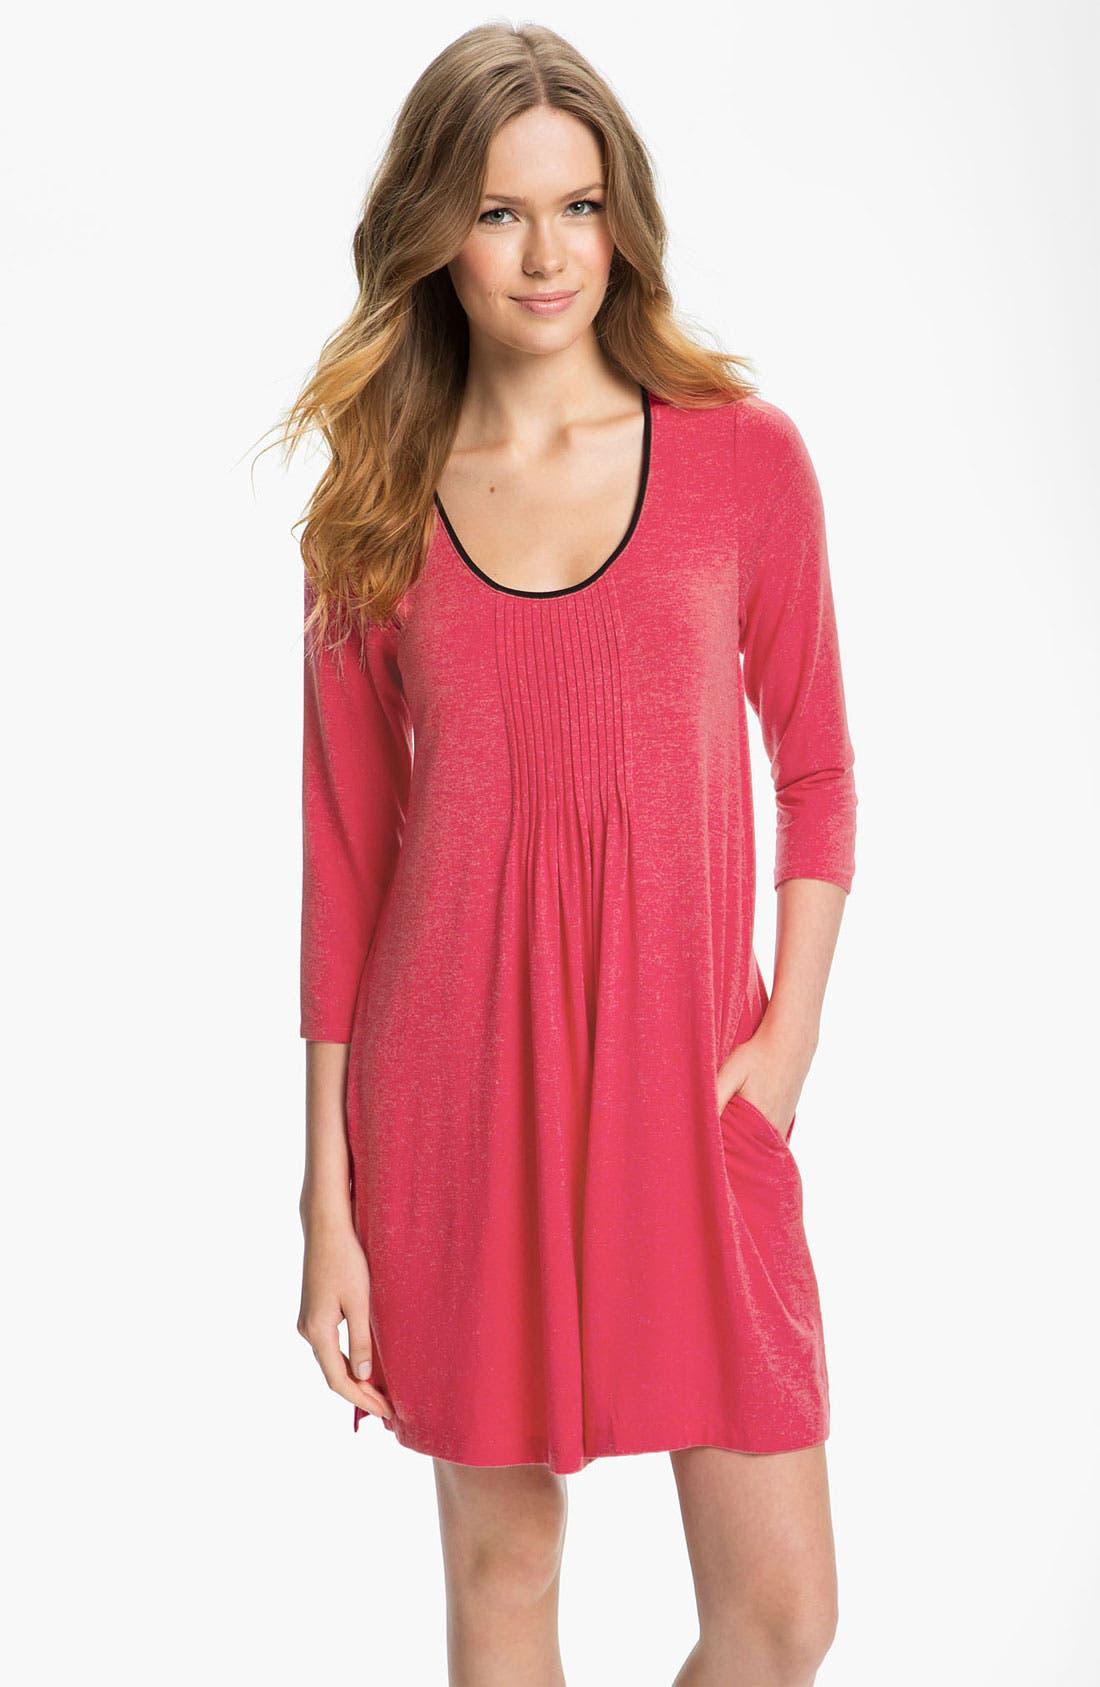 Main Image - DKNY '7 Easy Pieces' Pintuck Sleep Shirt